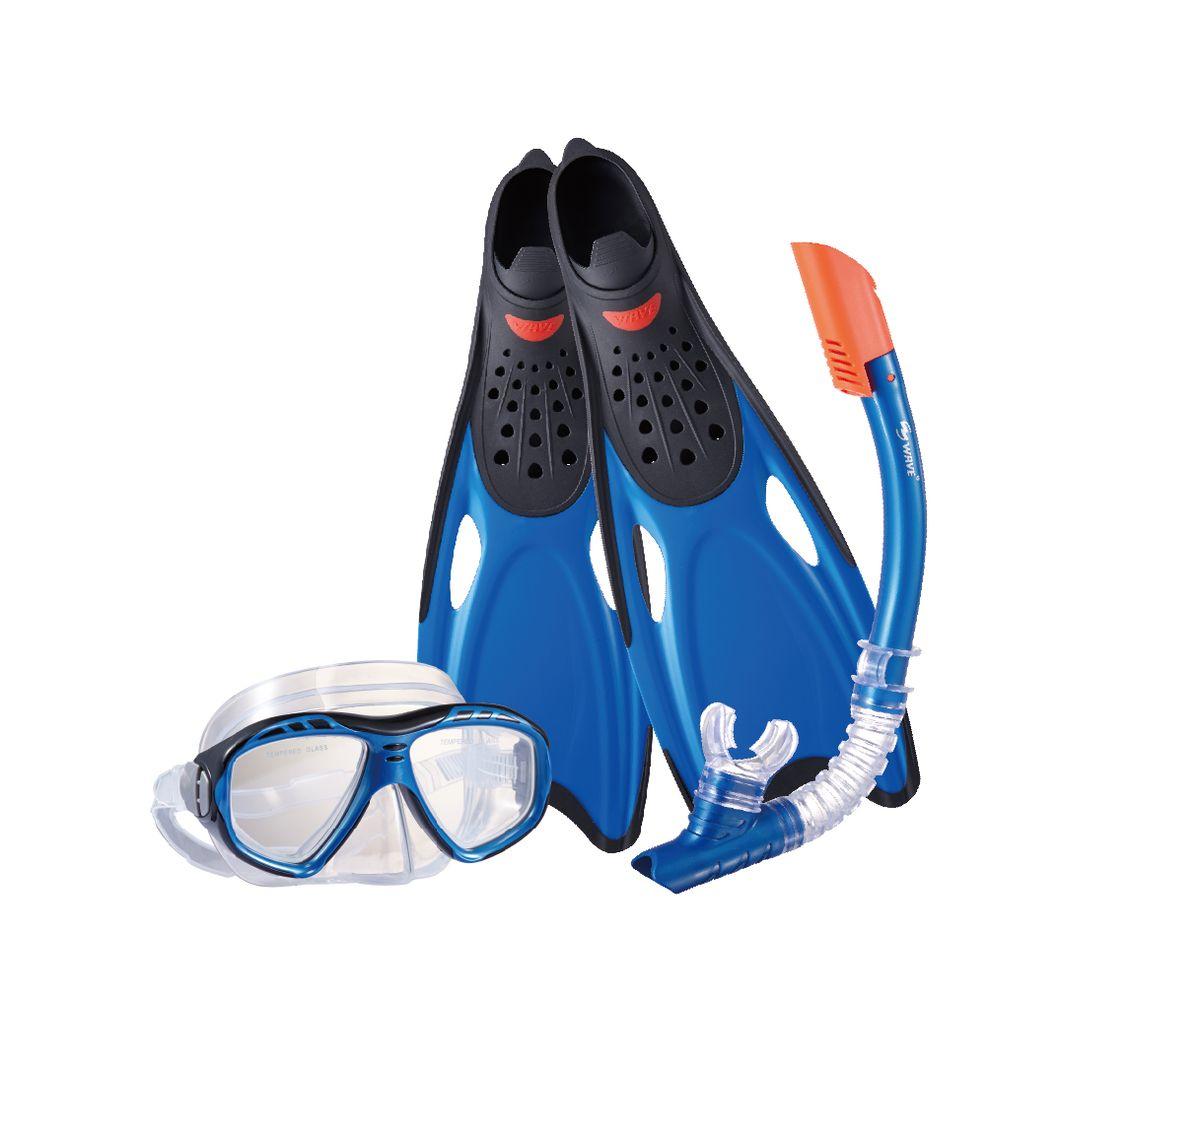 Комплект для плавания WAVE: маска, трубка, ласты, цвет: синий. Размер 40-41. MSF-1396S25BF71 ласты для плавания stingrey f37 размер 40 41